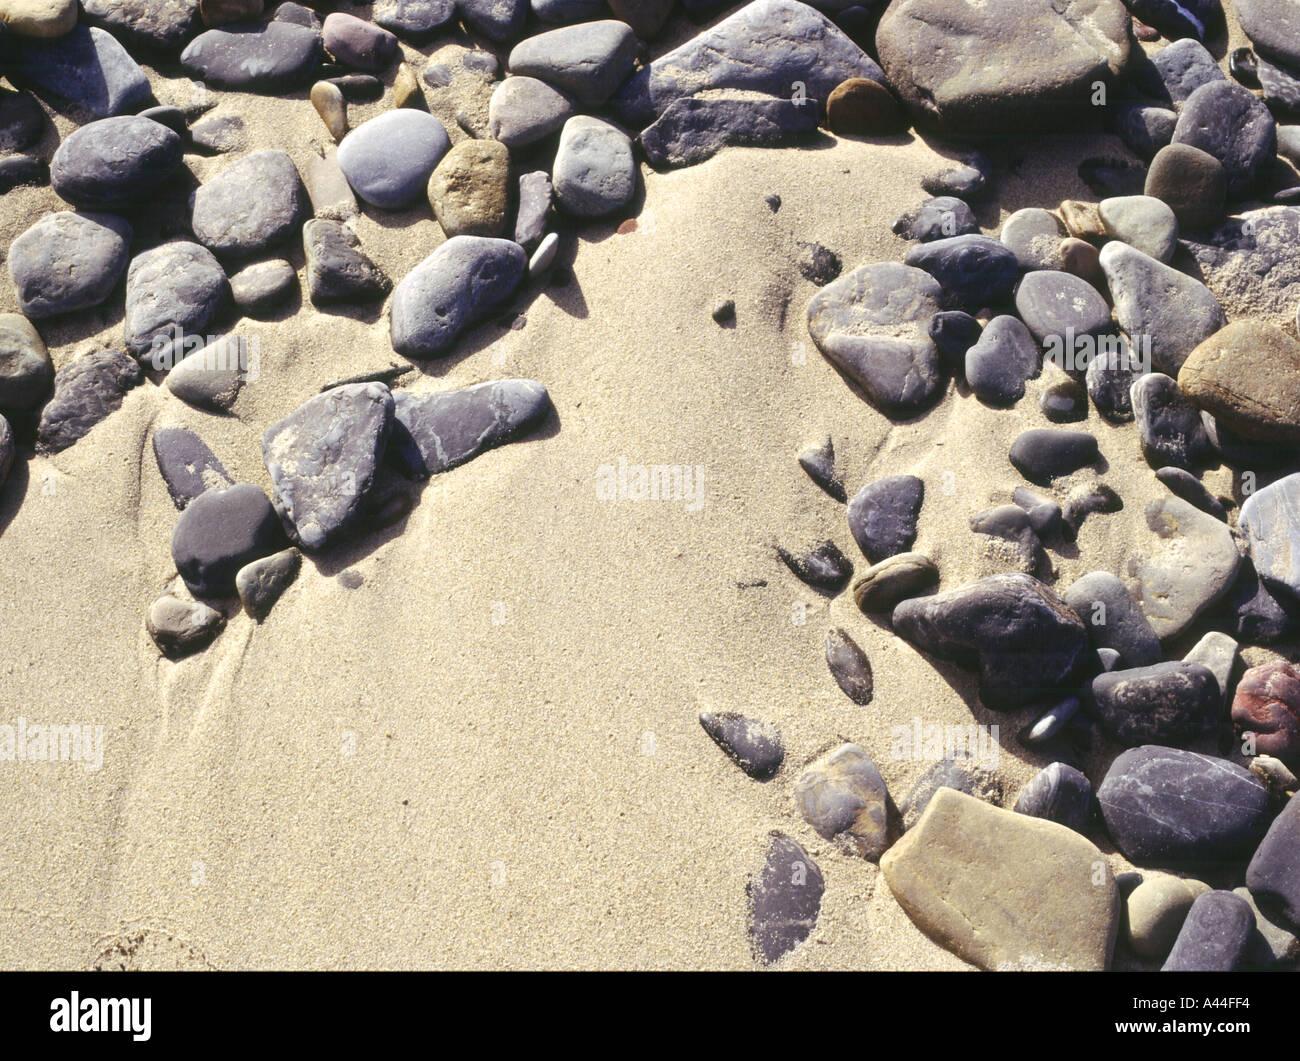 dh  SAND BACKGROUND Stone pebbles texture golden sand seashore close up textures Stock Photo